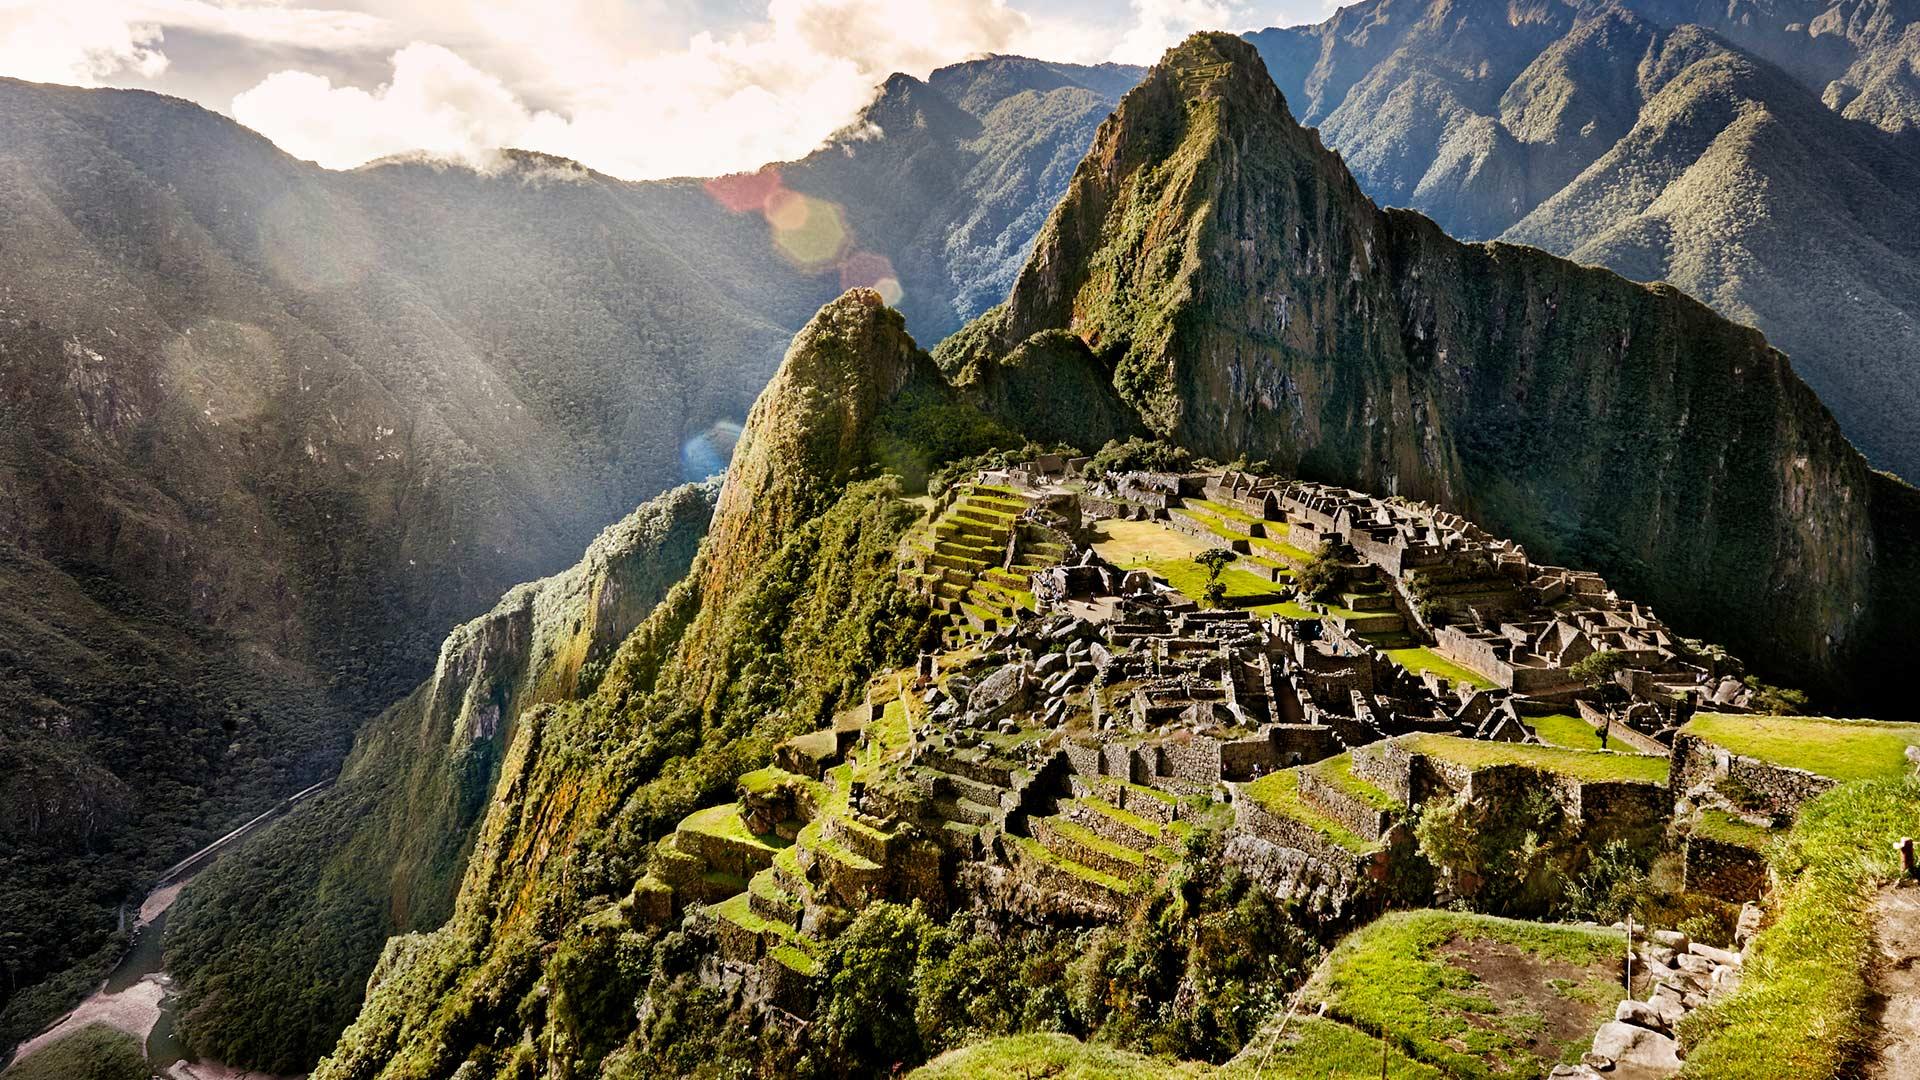 Machu Picchu: Santuario Histórico de Machu Picchu | Perú Travel